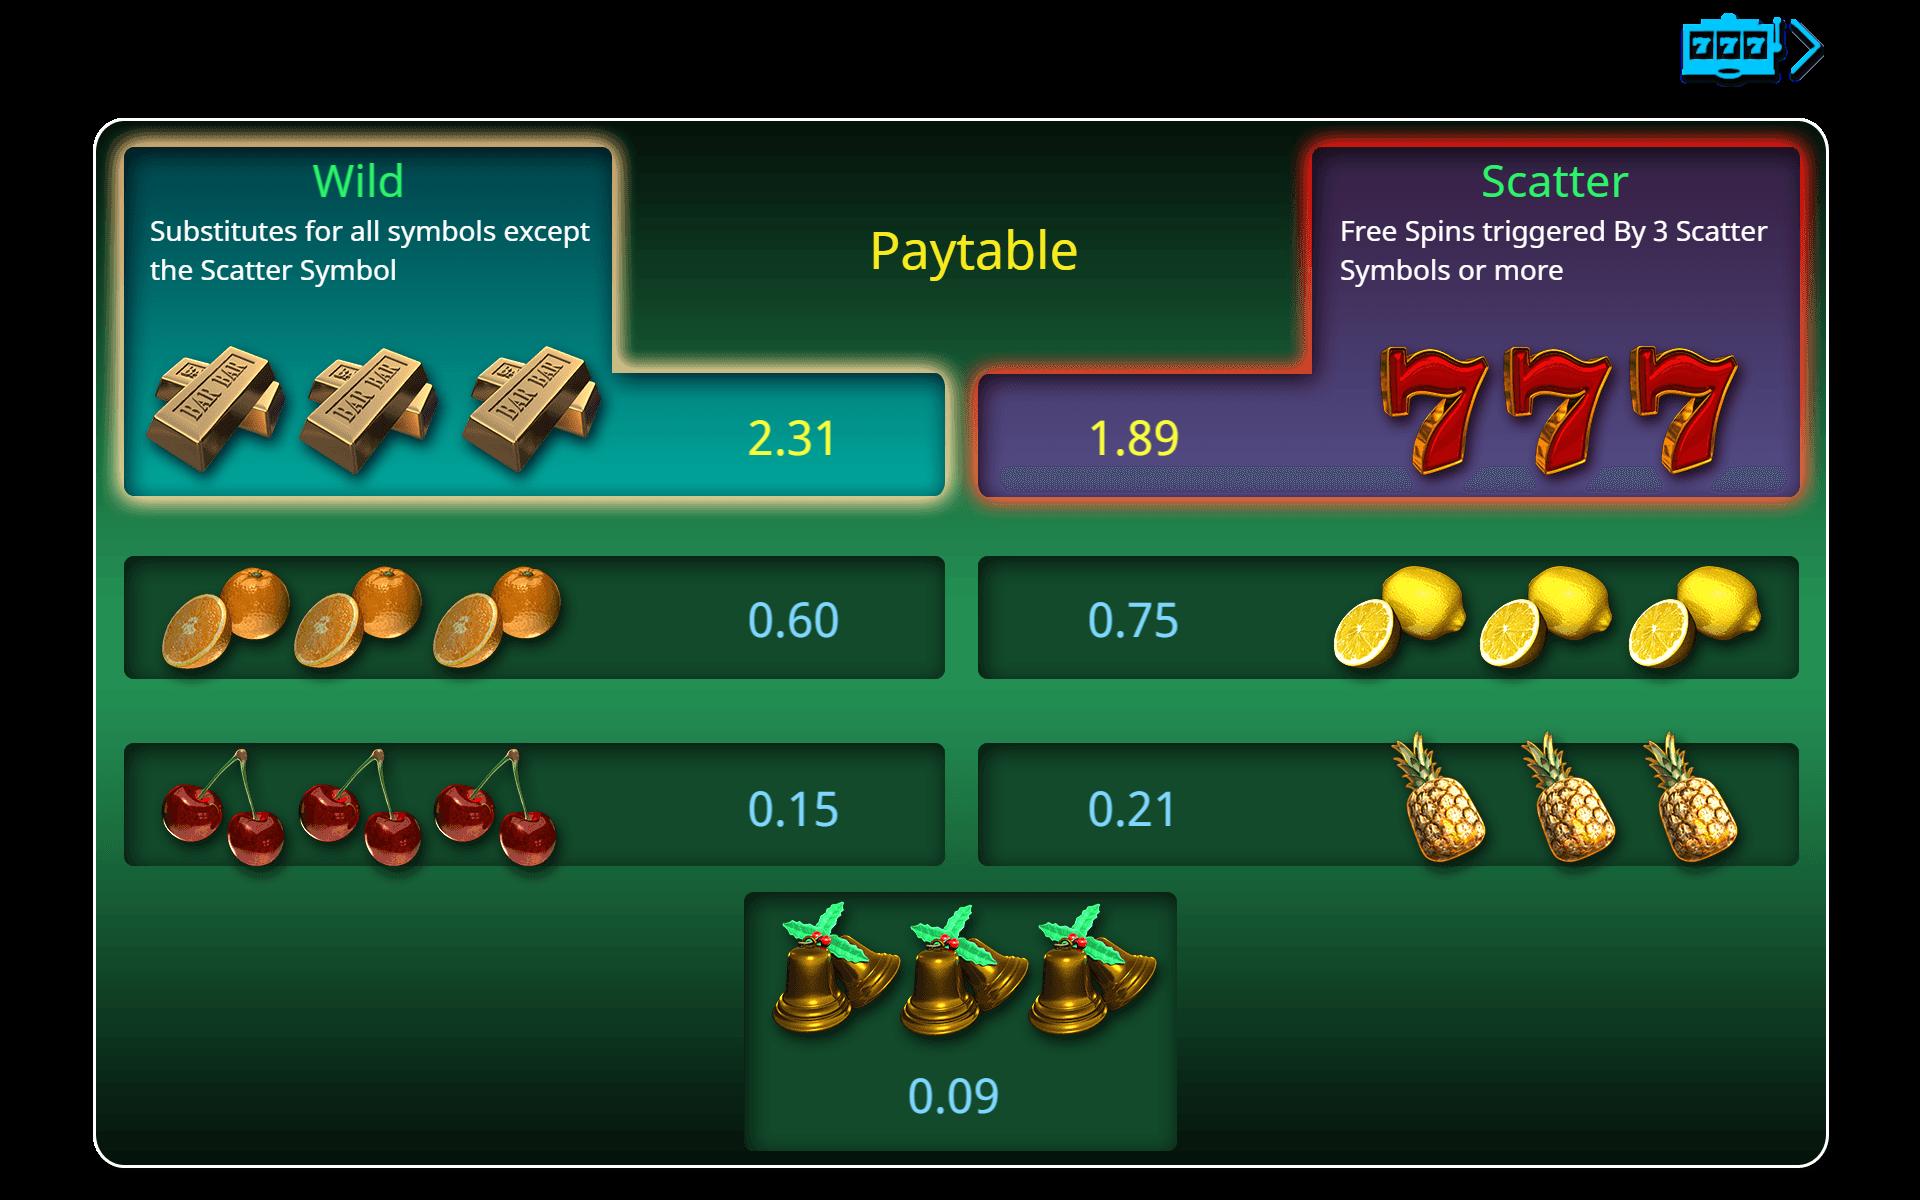 Casino bankid snabba uttag coins